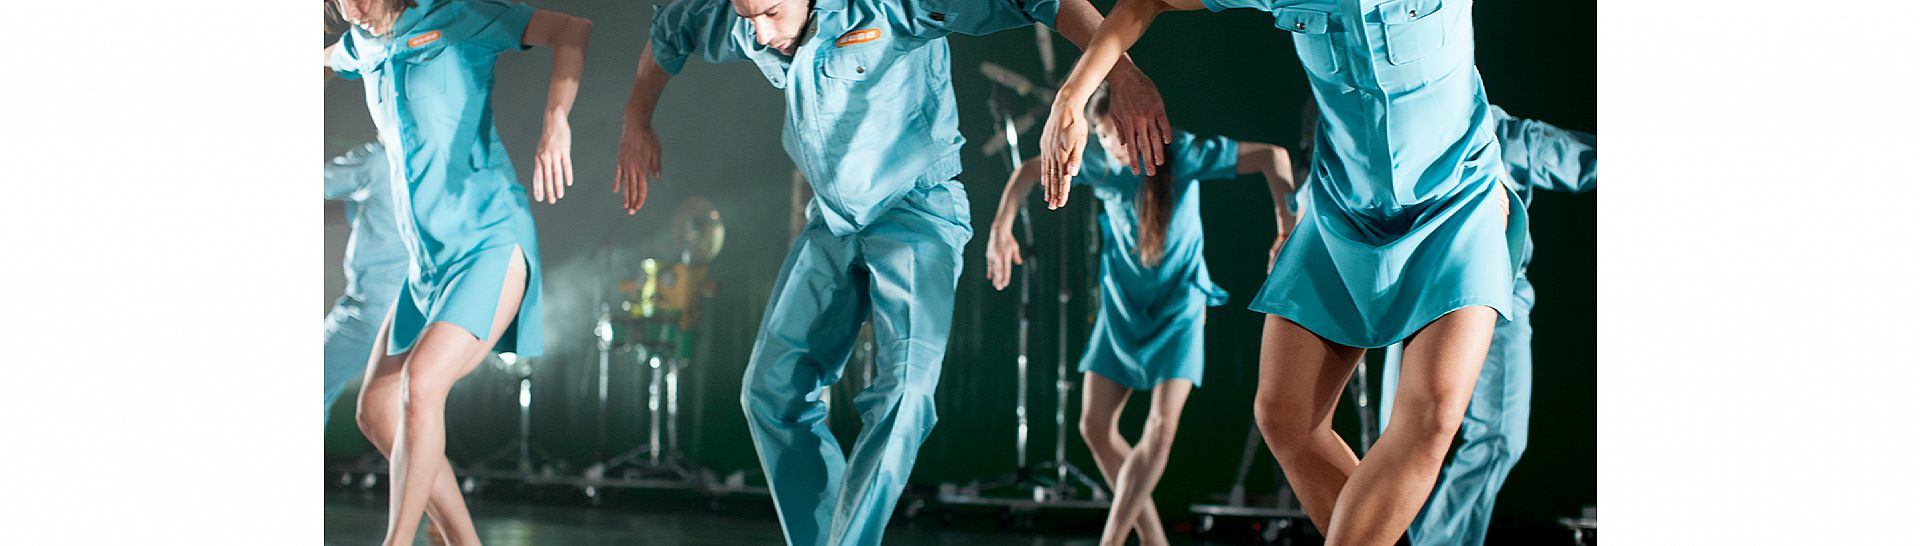 Blanca Li Dance Company05